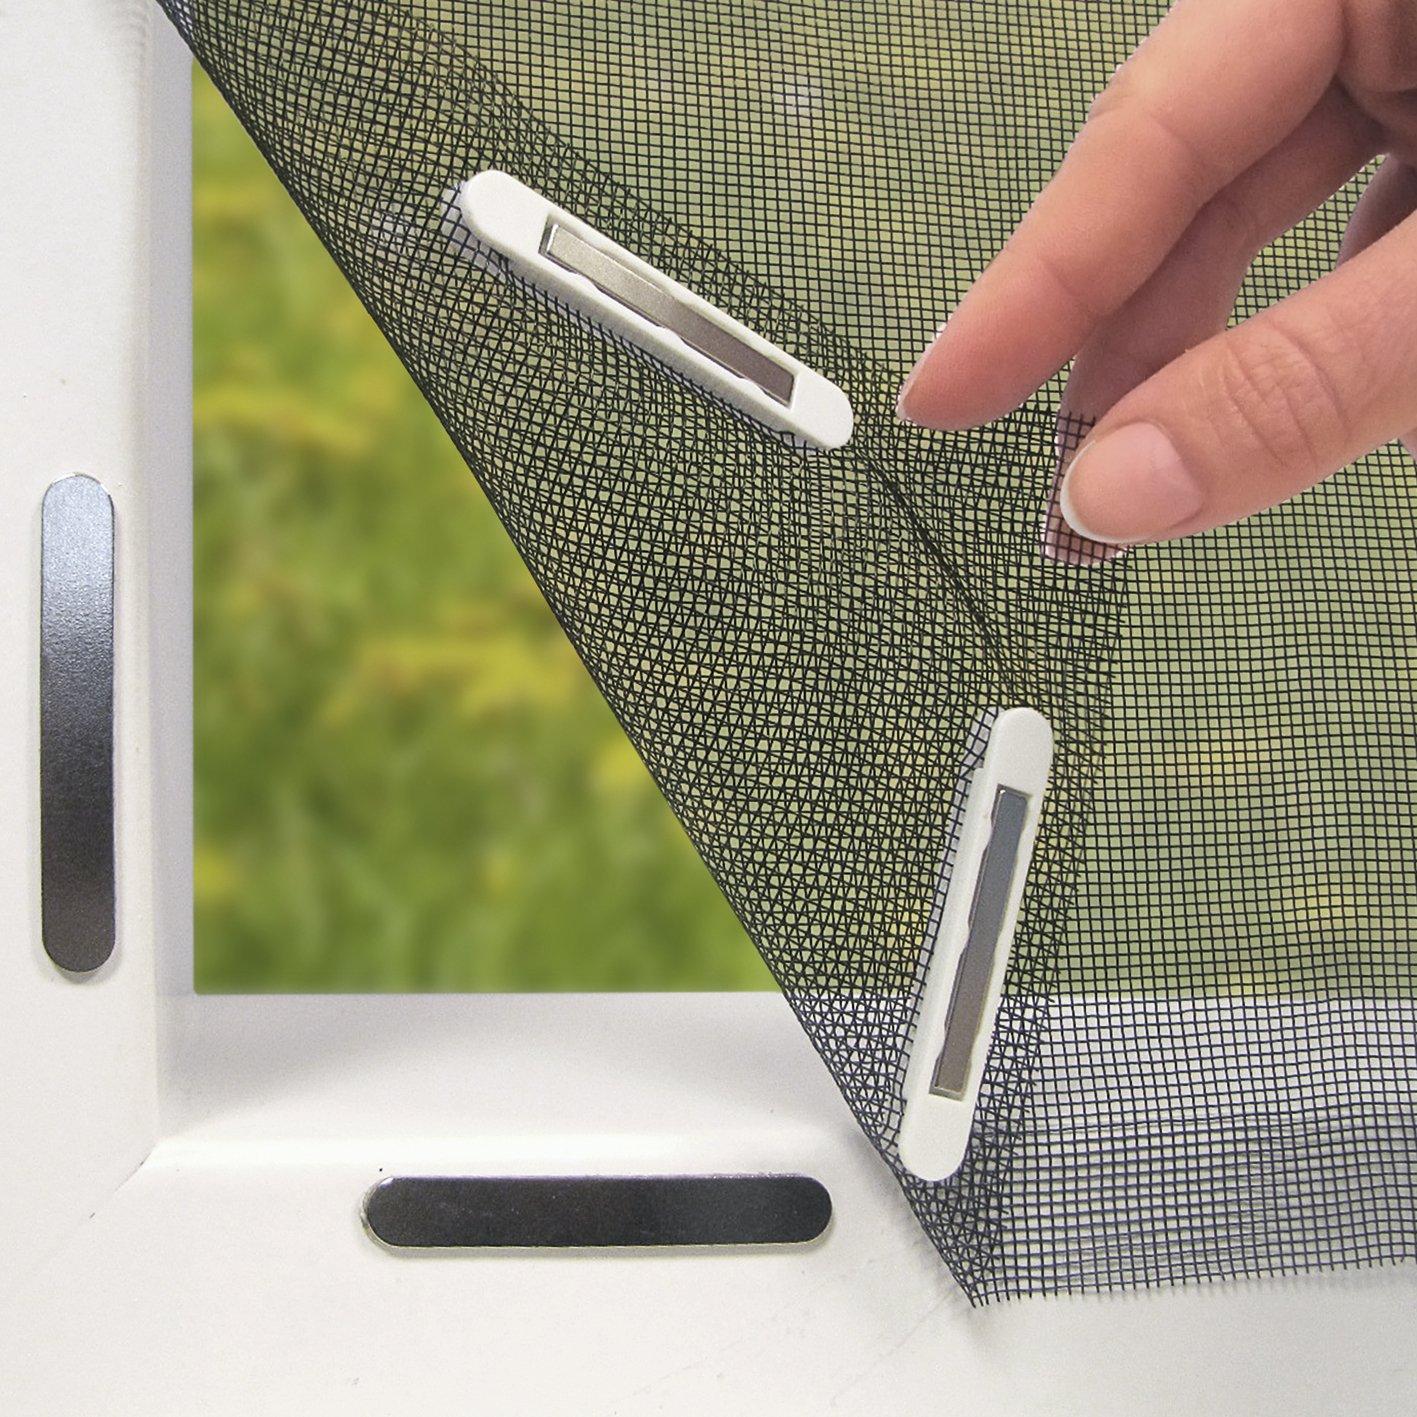 Relativ EASYmaxx Fenster-Moskitonetz mit Magnetbefestigung 150 x 130cm RL27